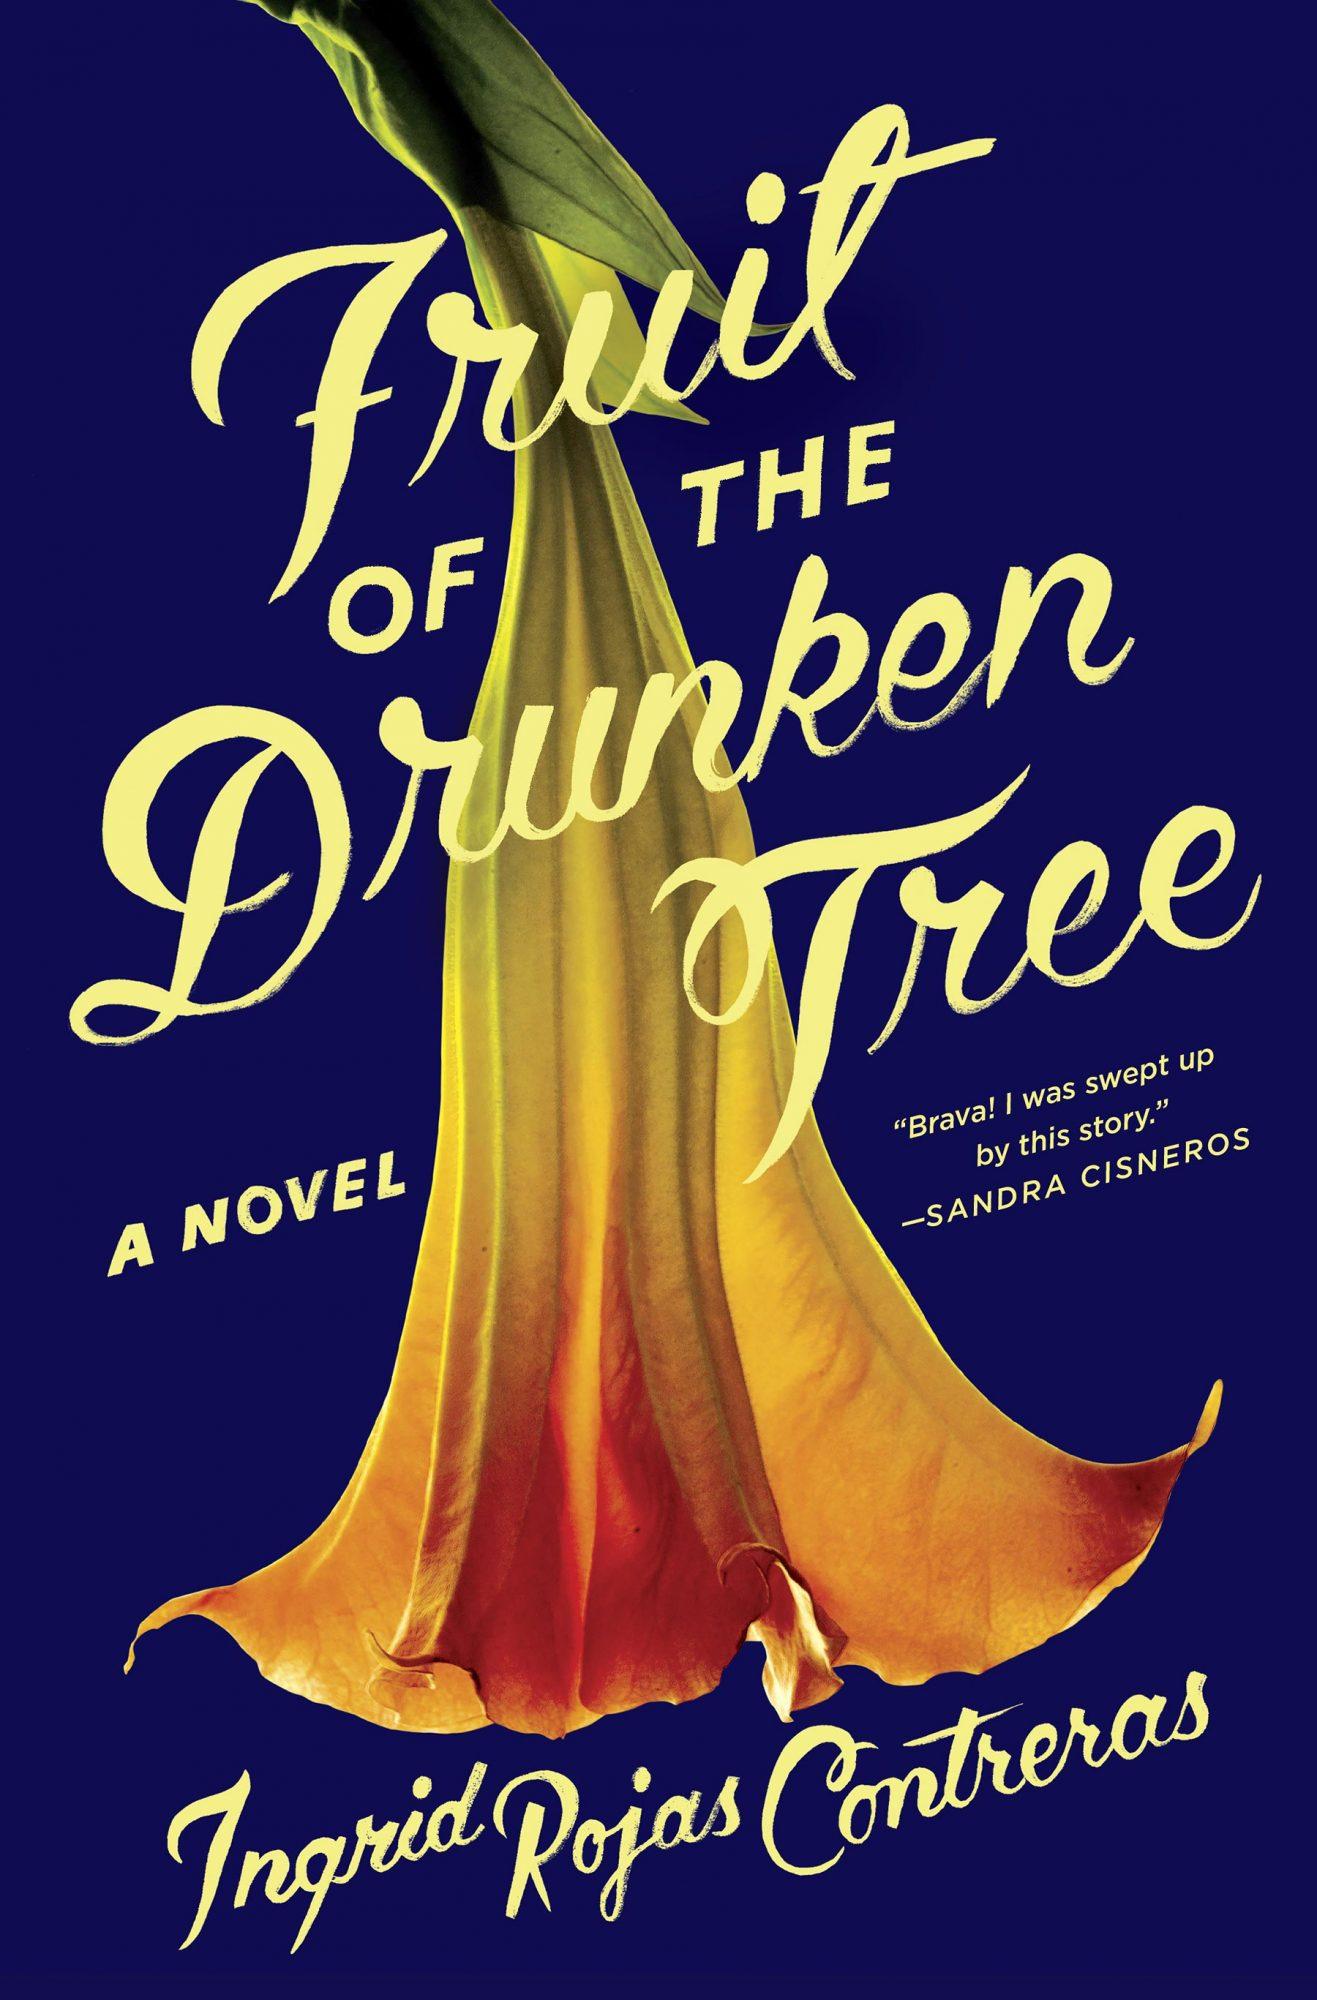 Fruit of the Drunken TreeA NOVELBy INGRID ROJAS CONTRERASCR: Doubleday